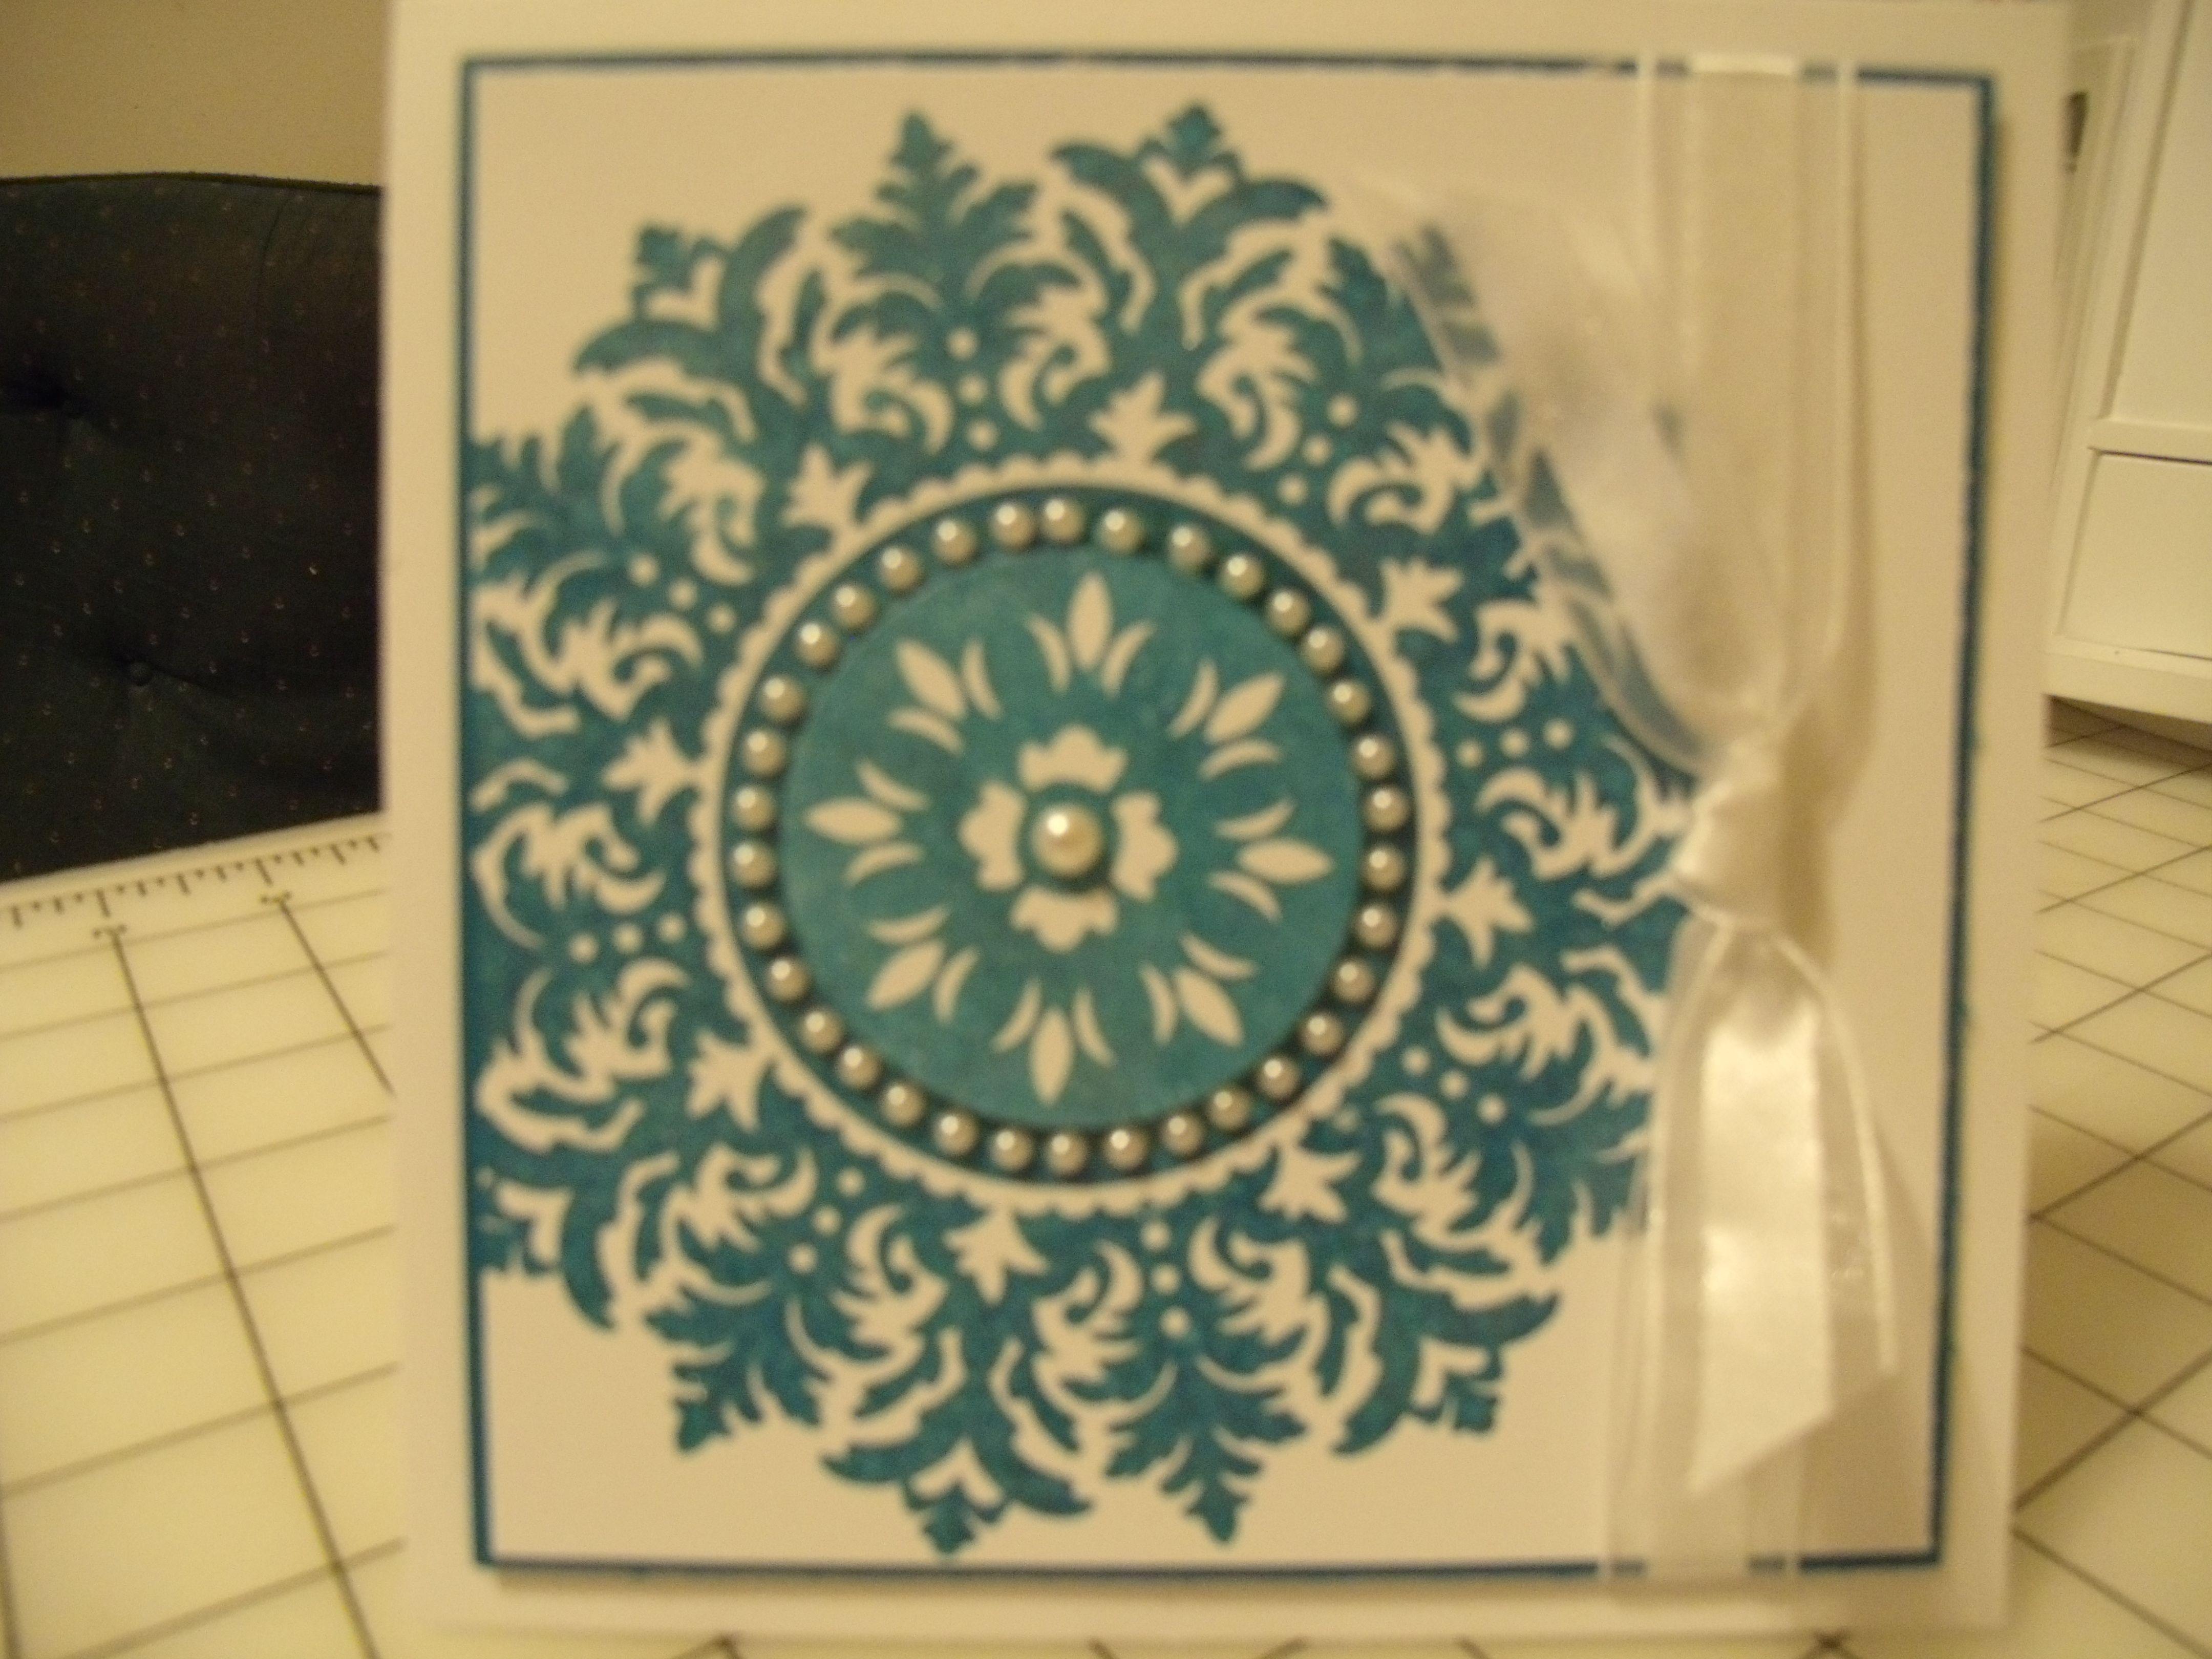 Wedding Craft Ideas Pinterest : Wedding Card Craft Ideas Pinterest